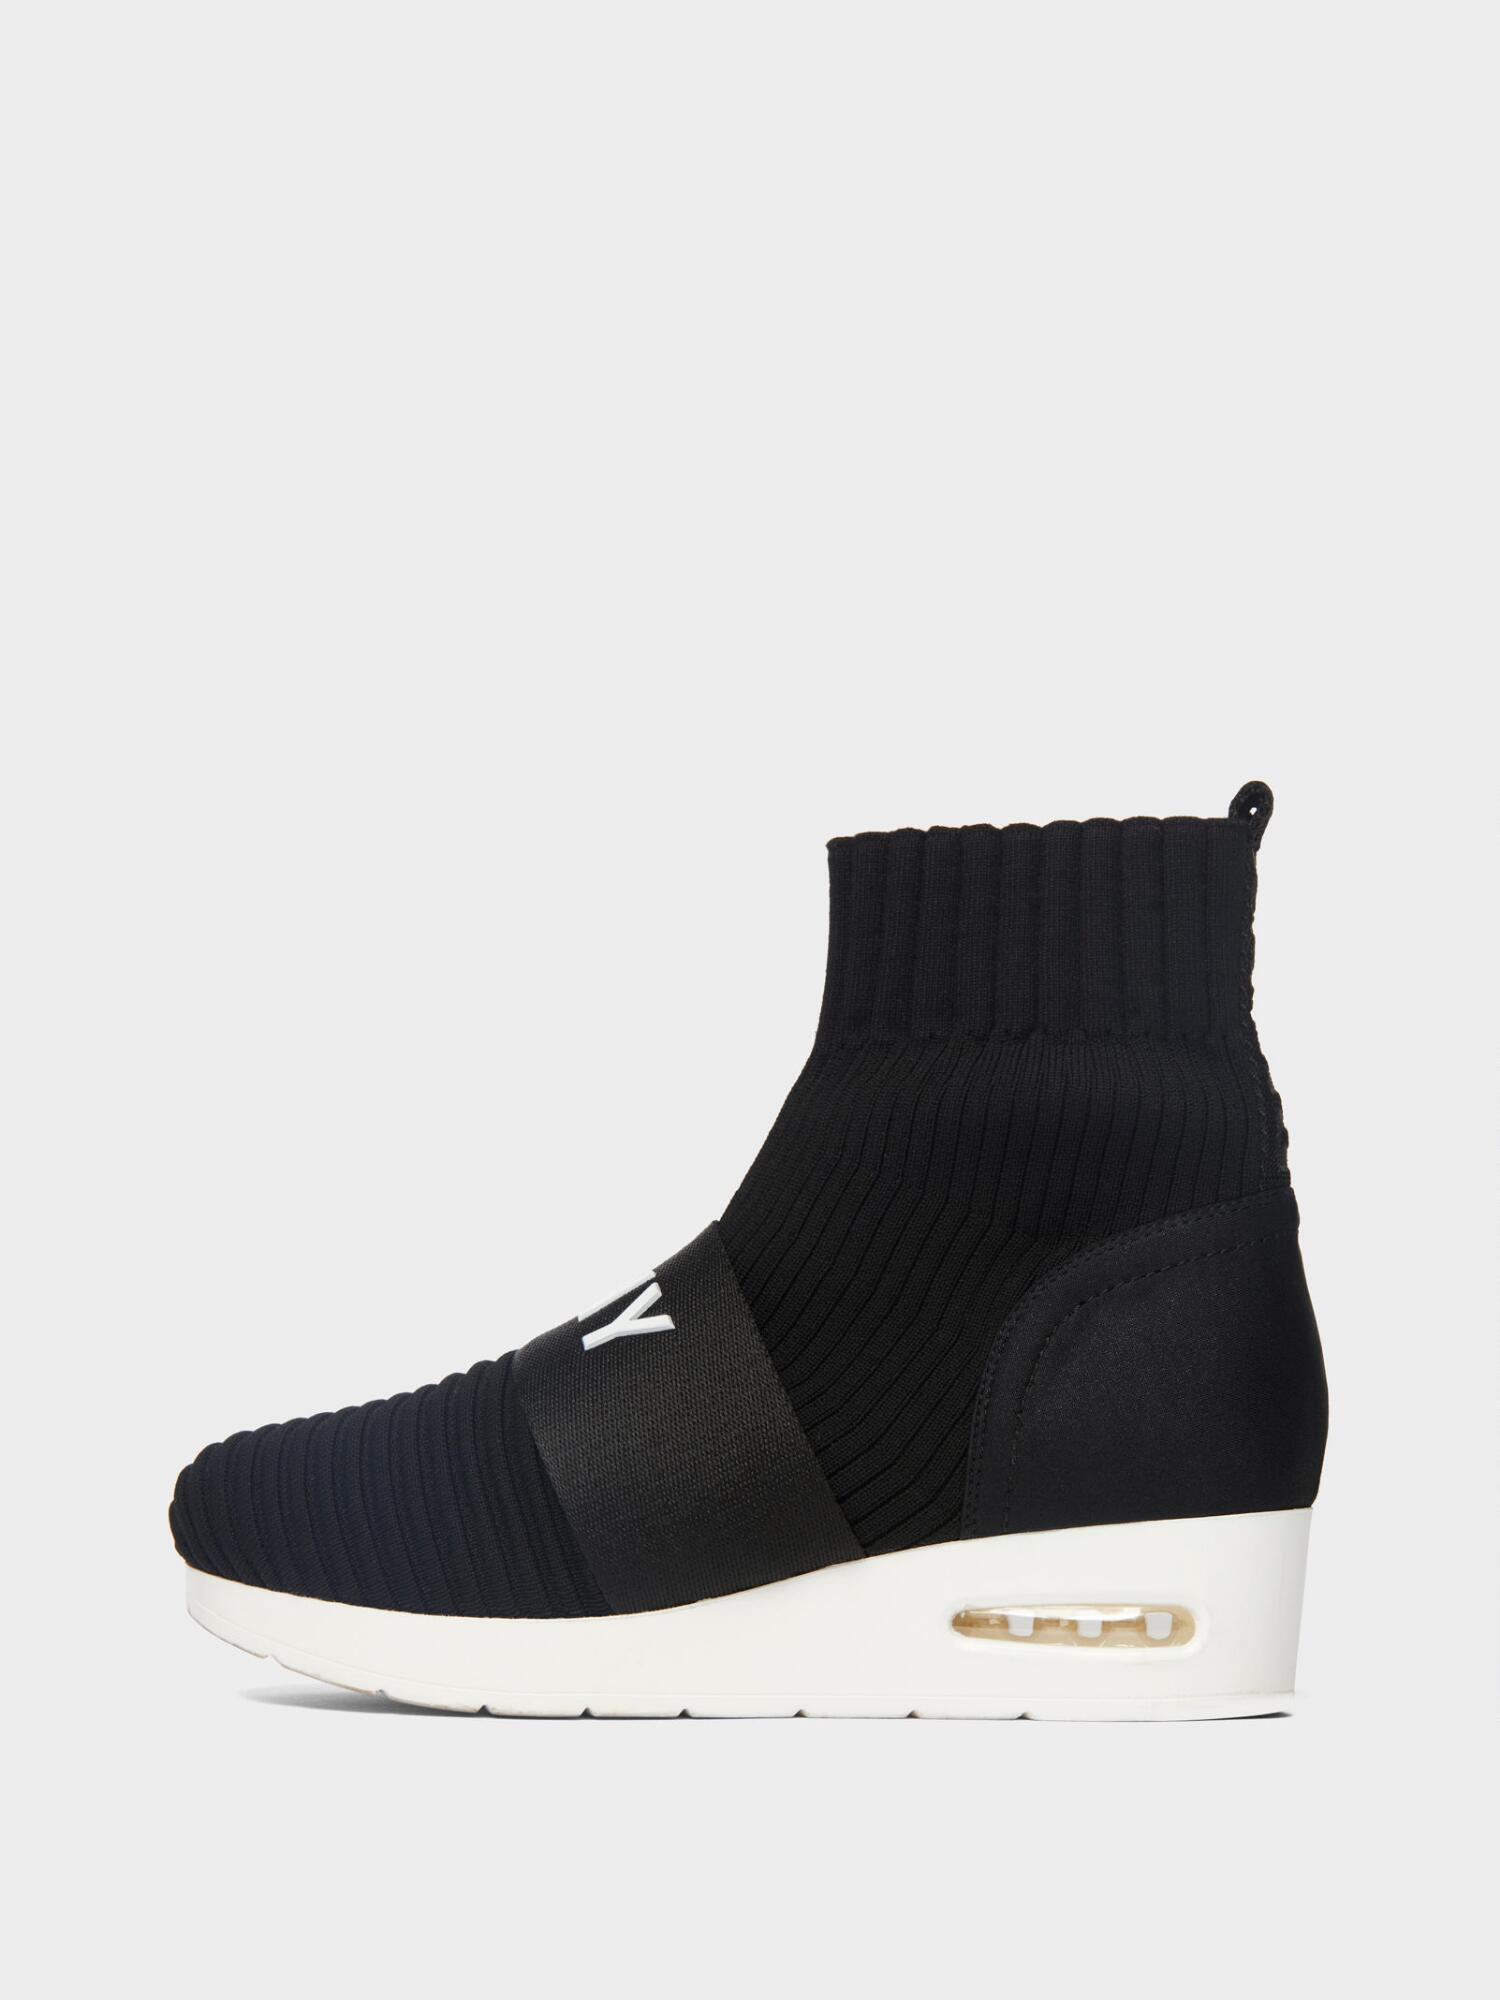 2cad92e158e Donna Karan Anna Slip-On Wedge Sneaker In Black